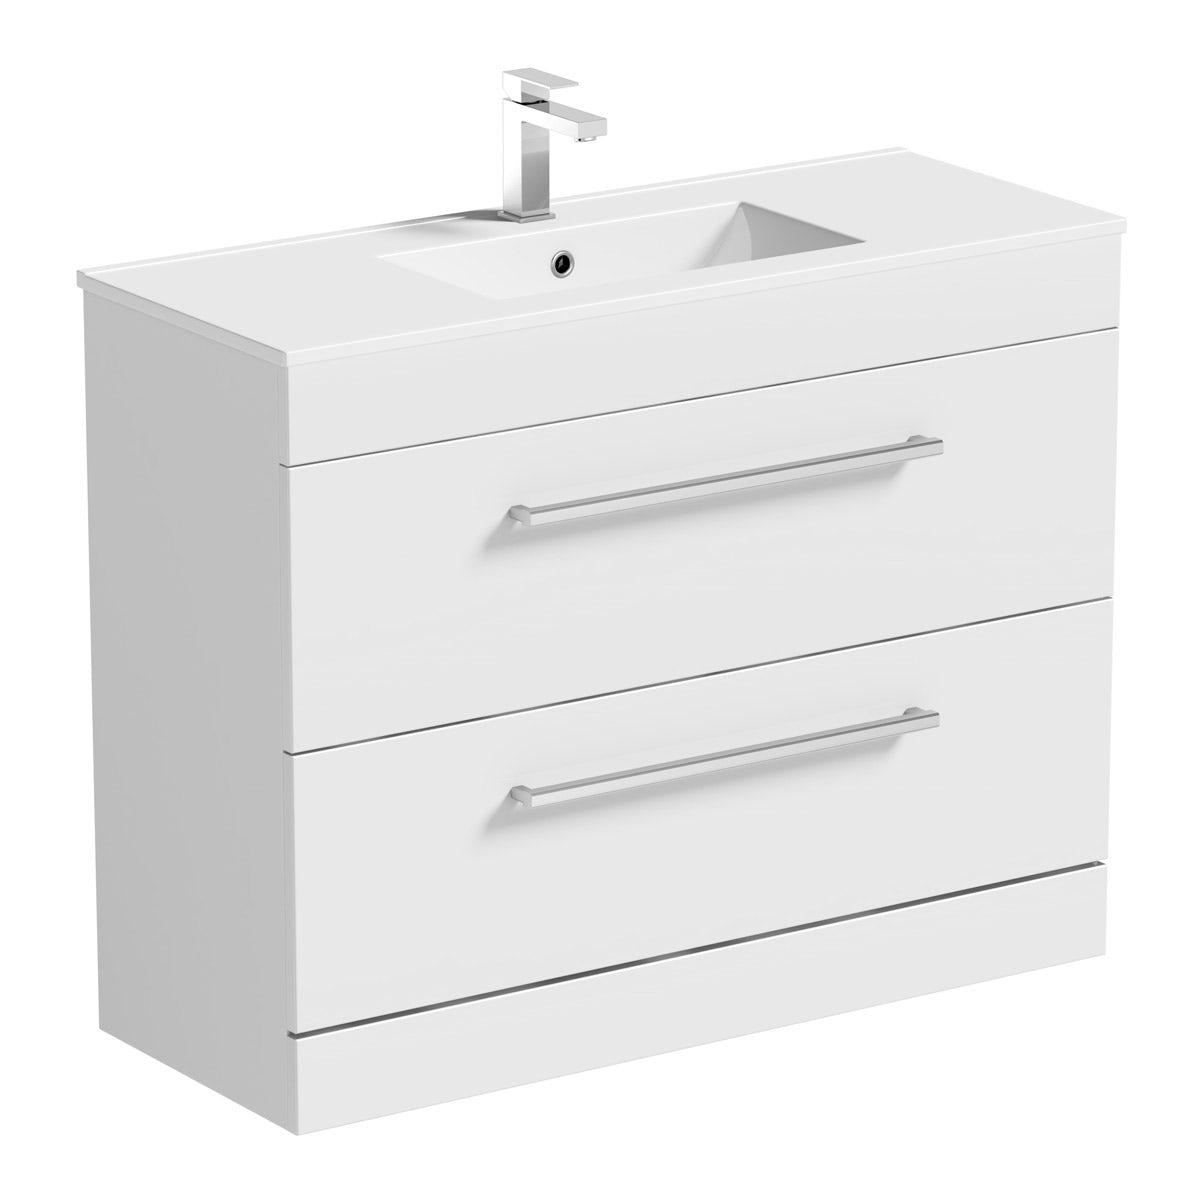 Orchard Derwent white vanity drawer unit and basin 1000mm